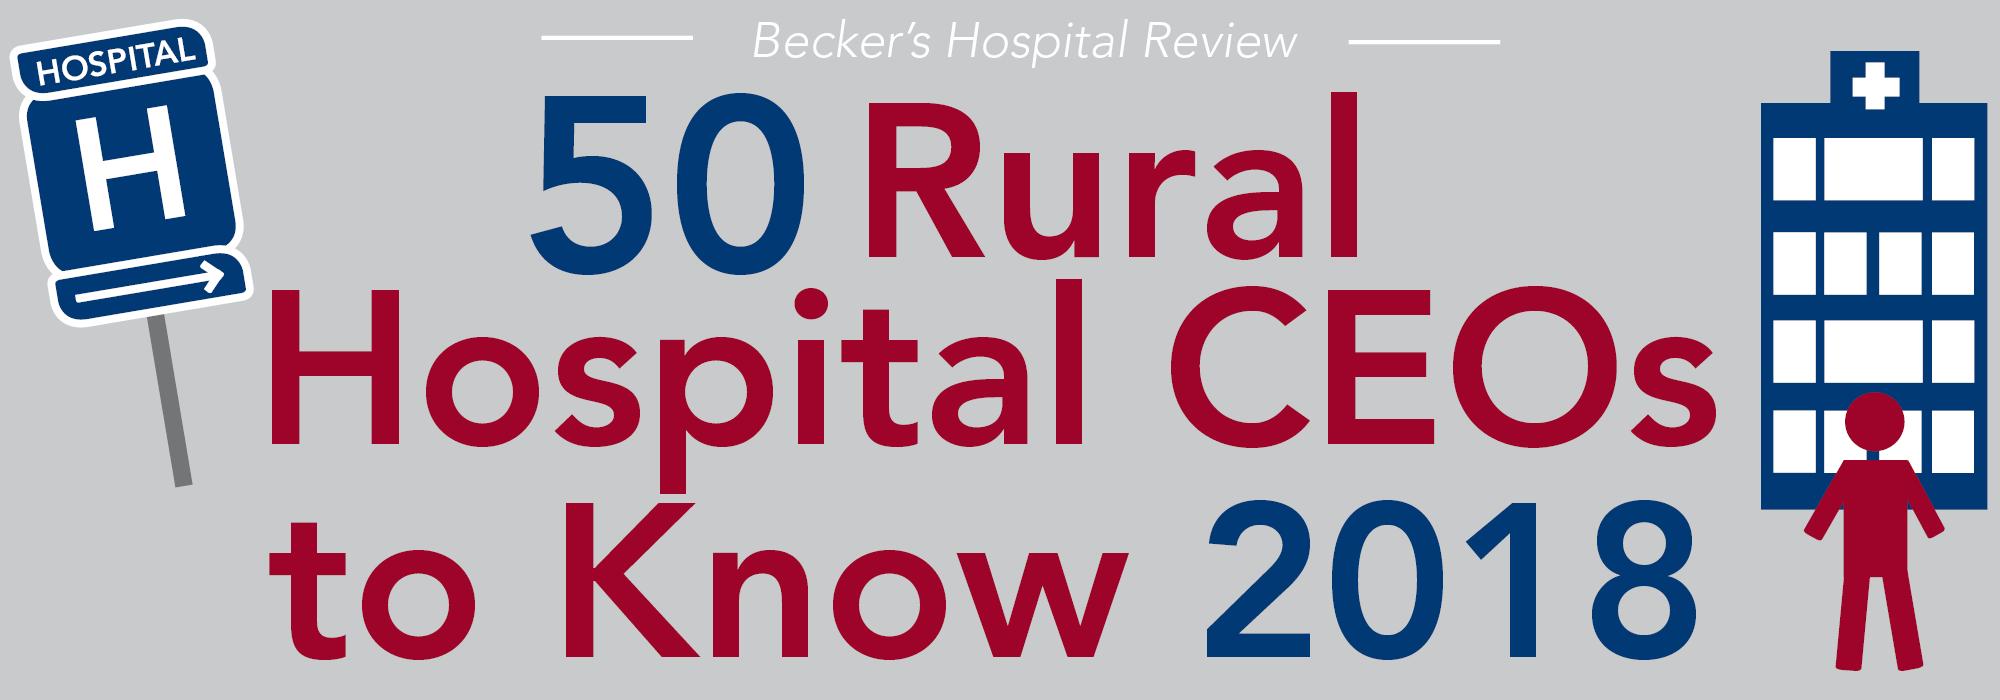 Rural Hospital CEOs 2018